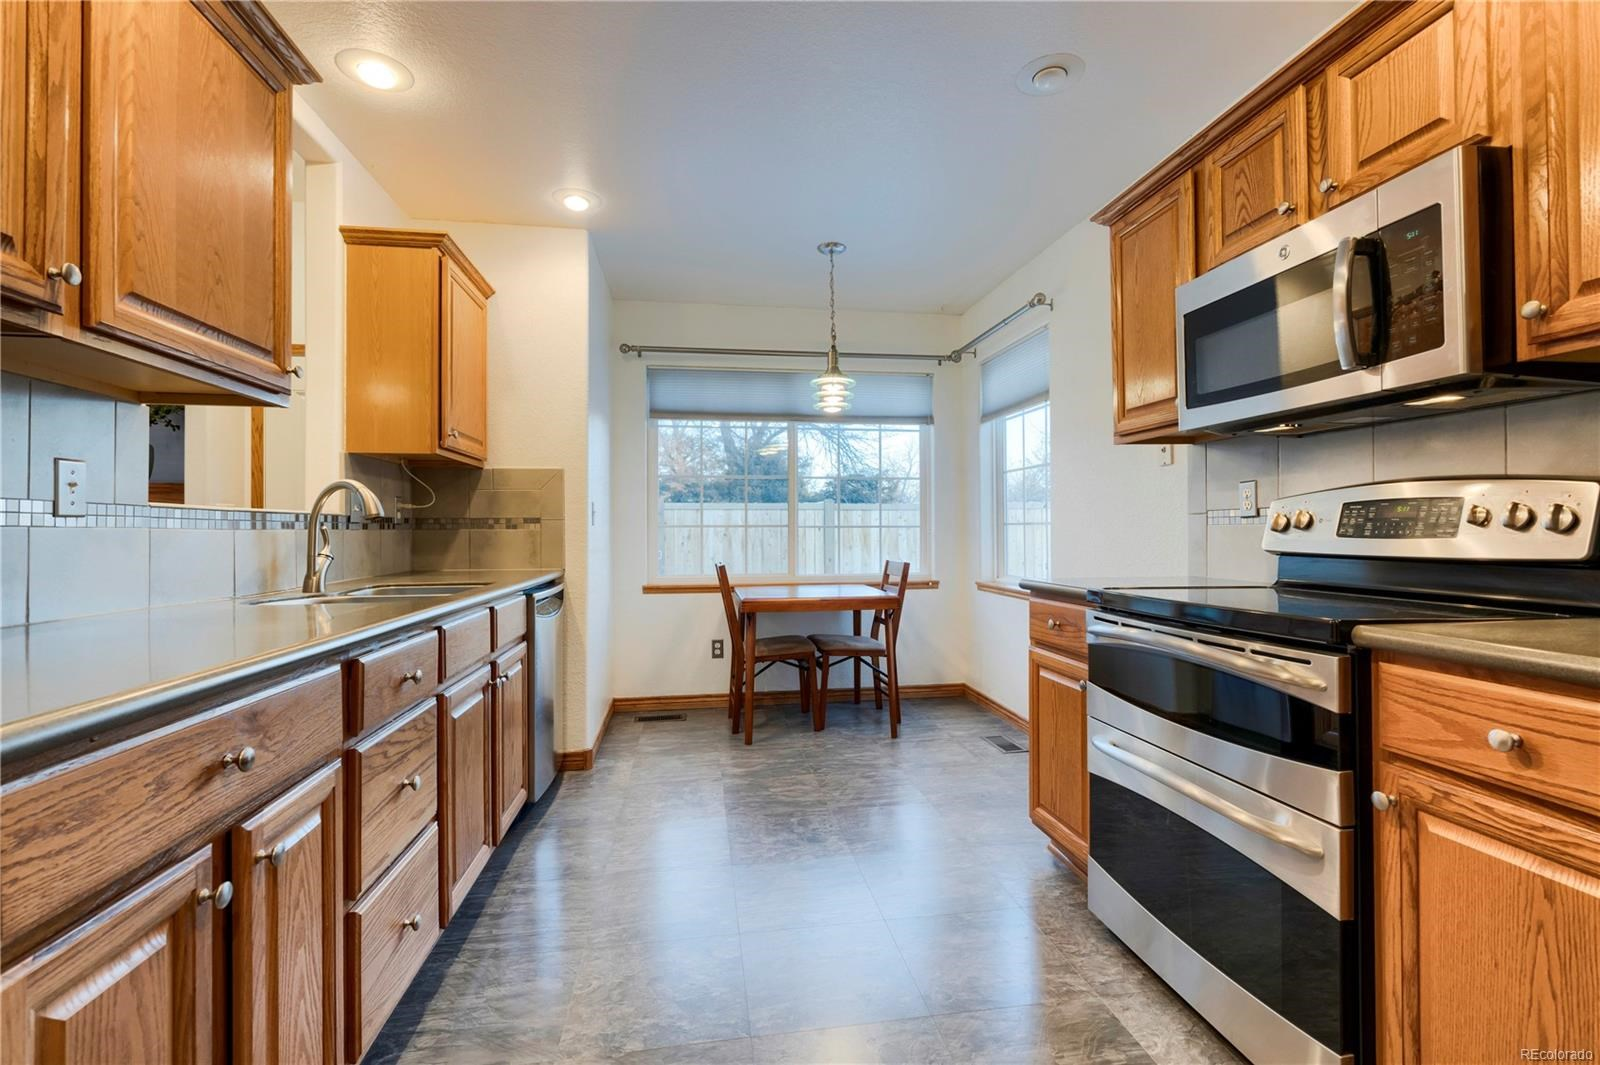 MLS# 7511958 - 7 - 900 Arbor Avenue #6, Fort Collins, CO 80526